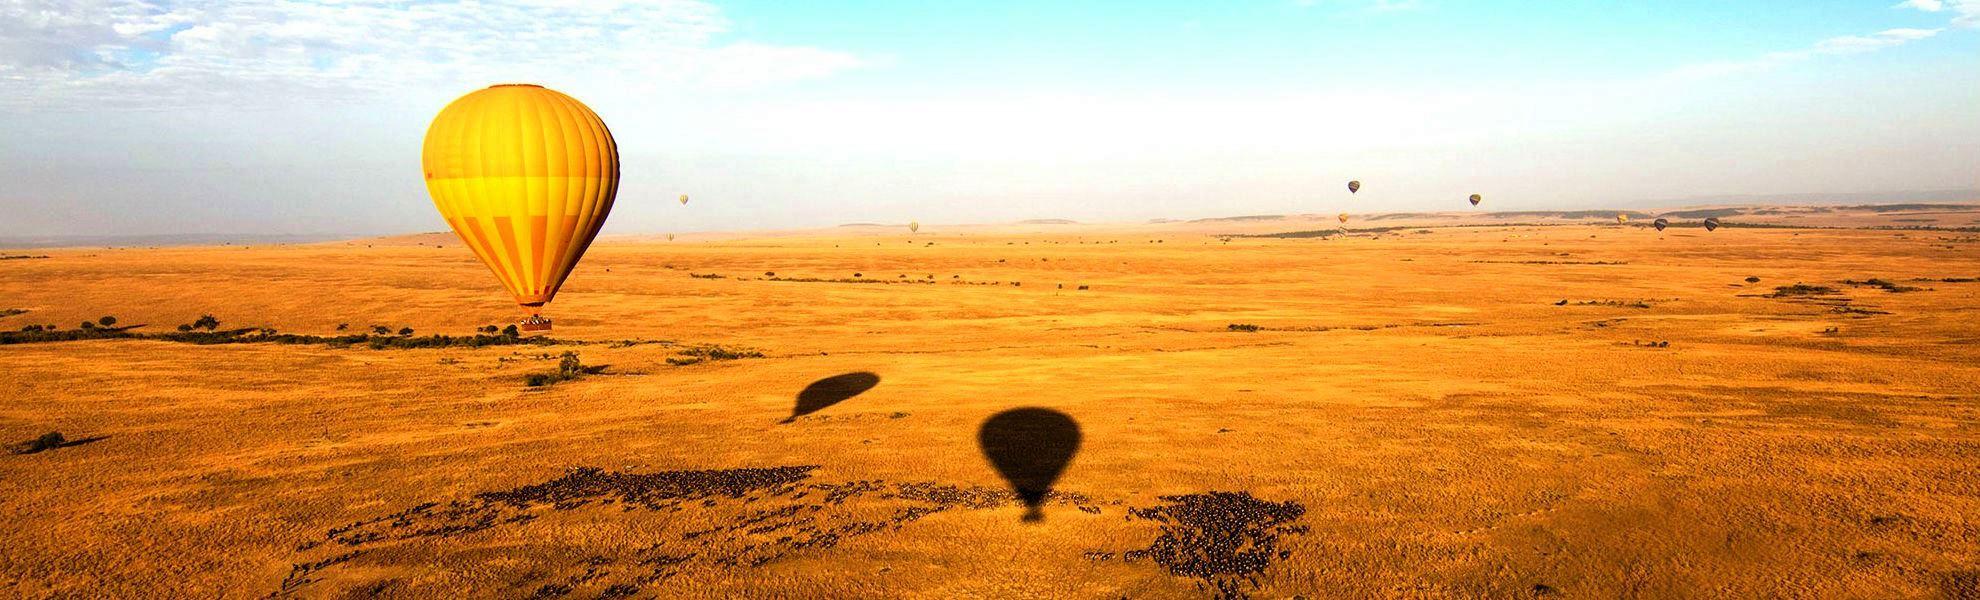 Kenia Große Tierwanderung Ballonsafari